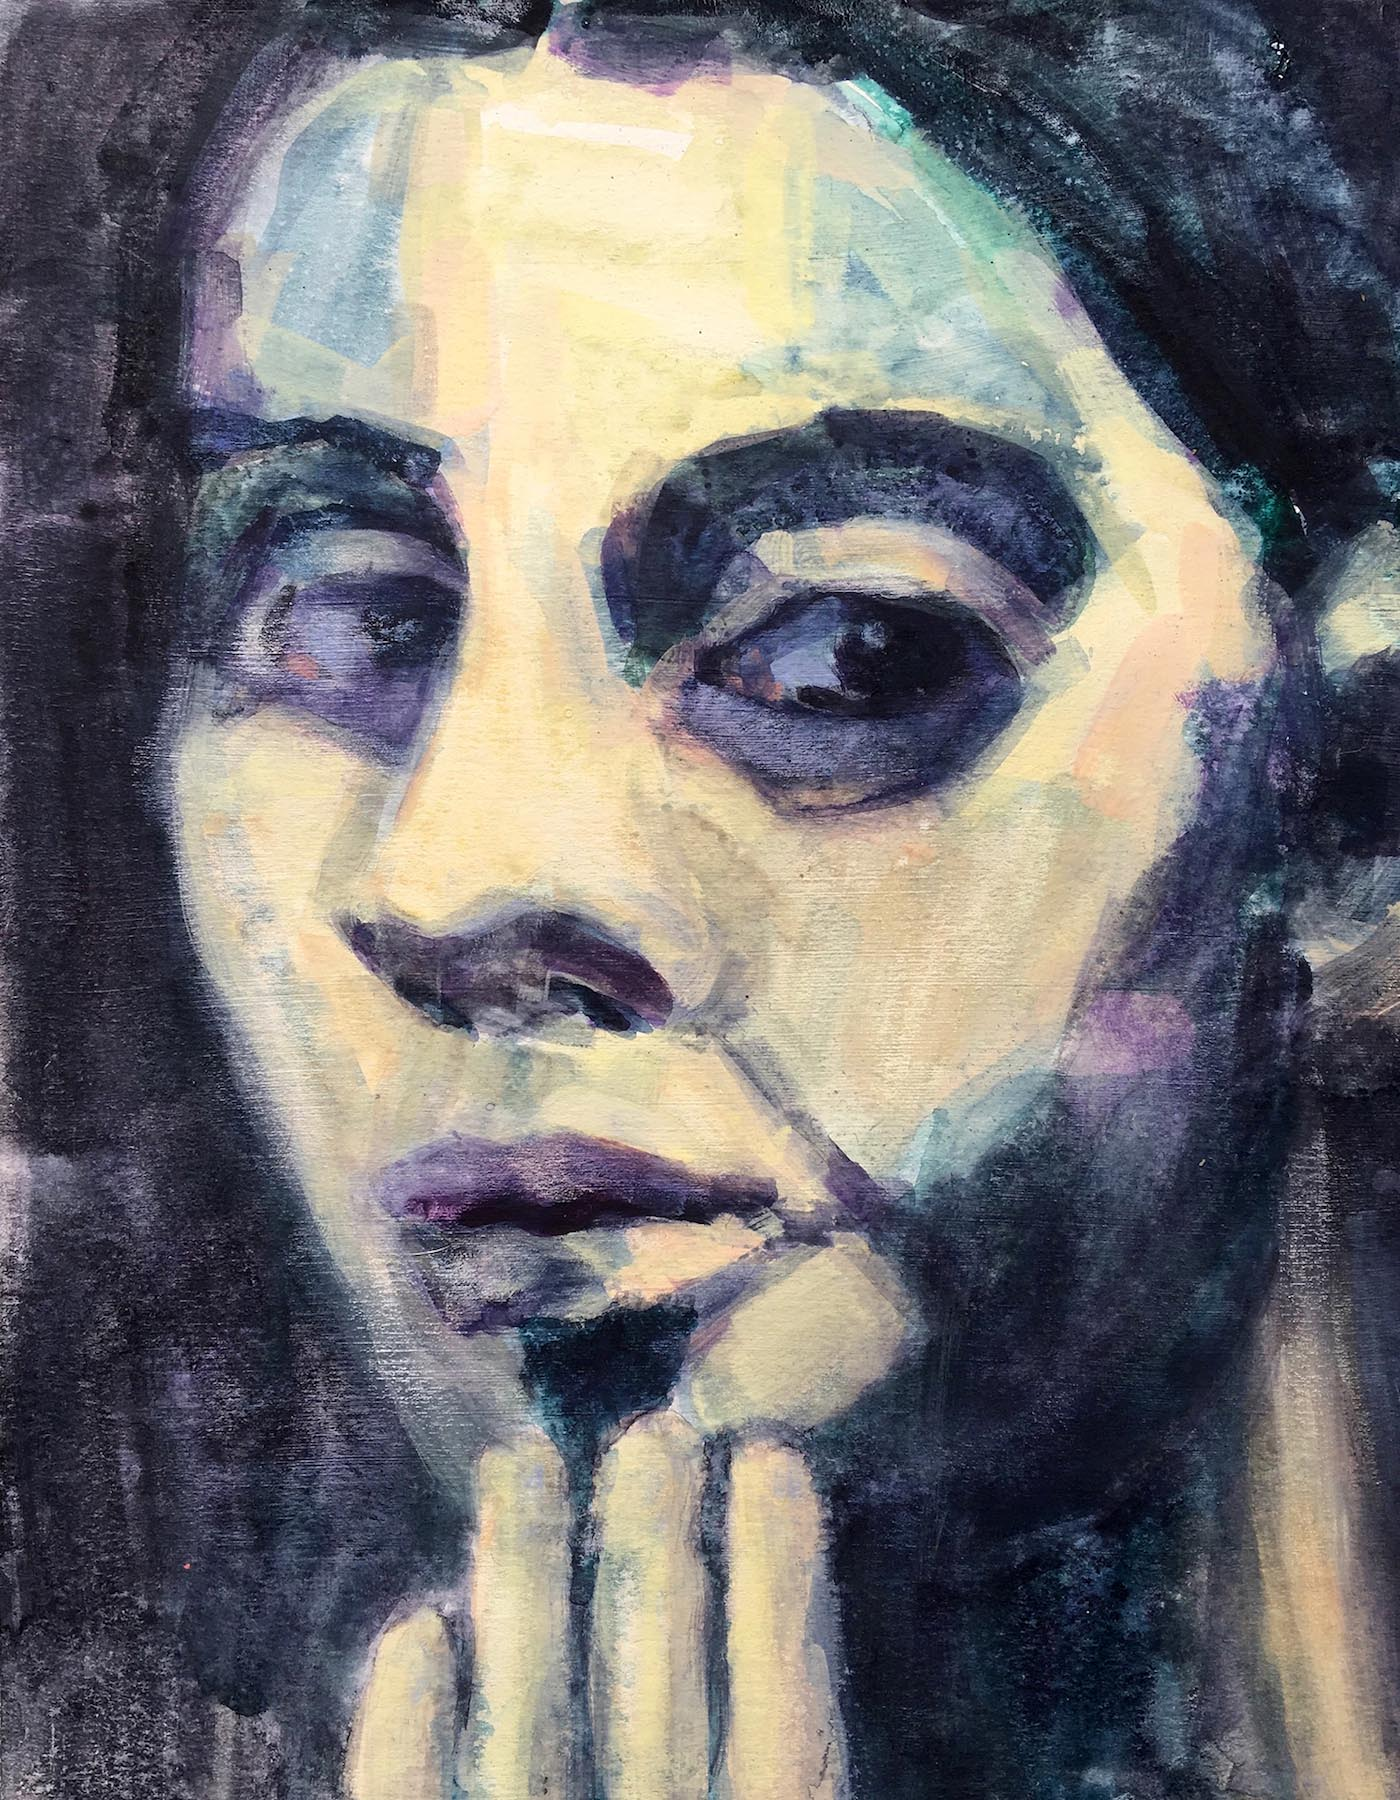 Colleen Kiely, Paula #6, 2018, Gouache & watercolor on acid-free watercolor paper, 14 x 11 in.